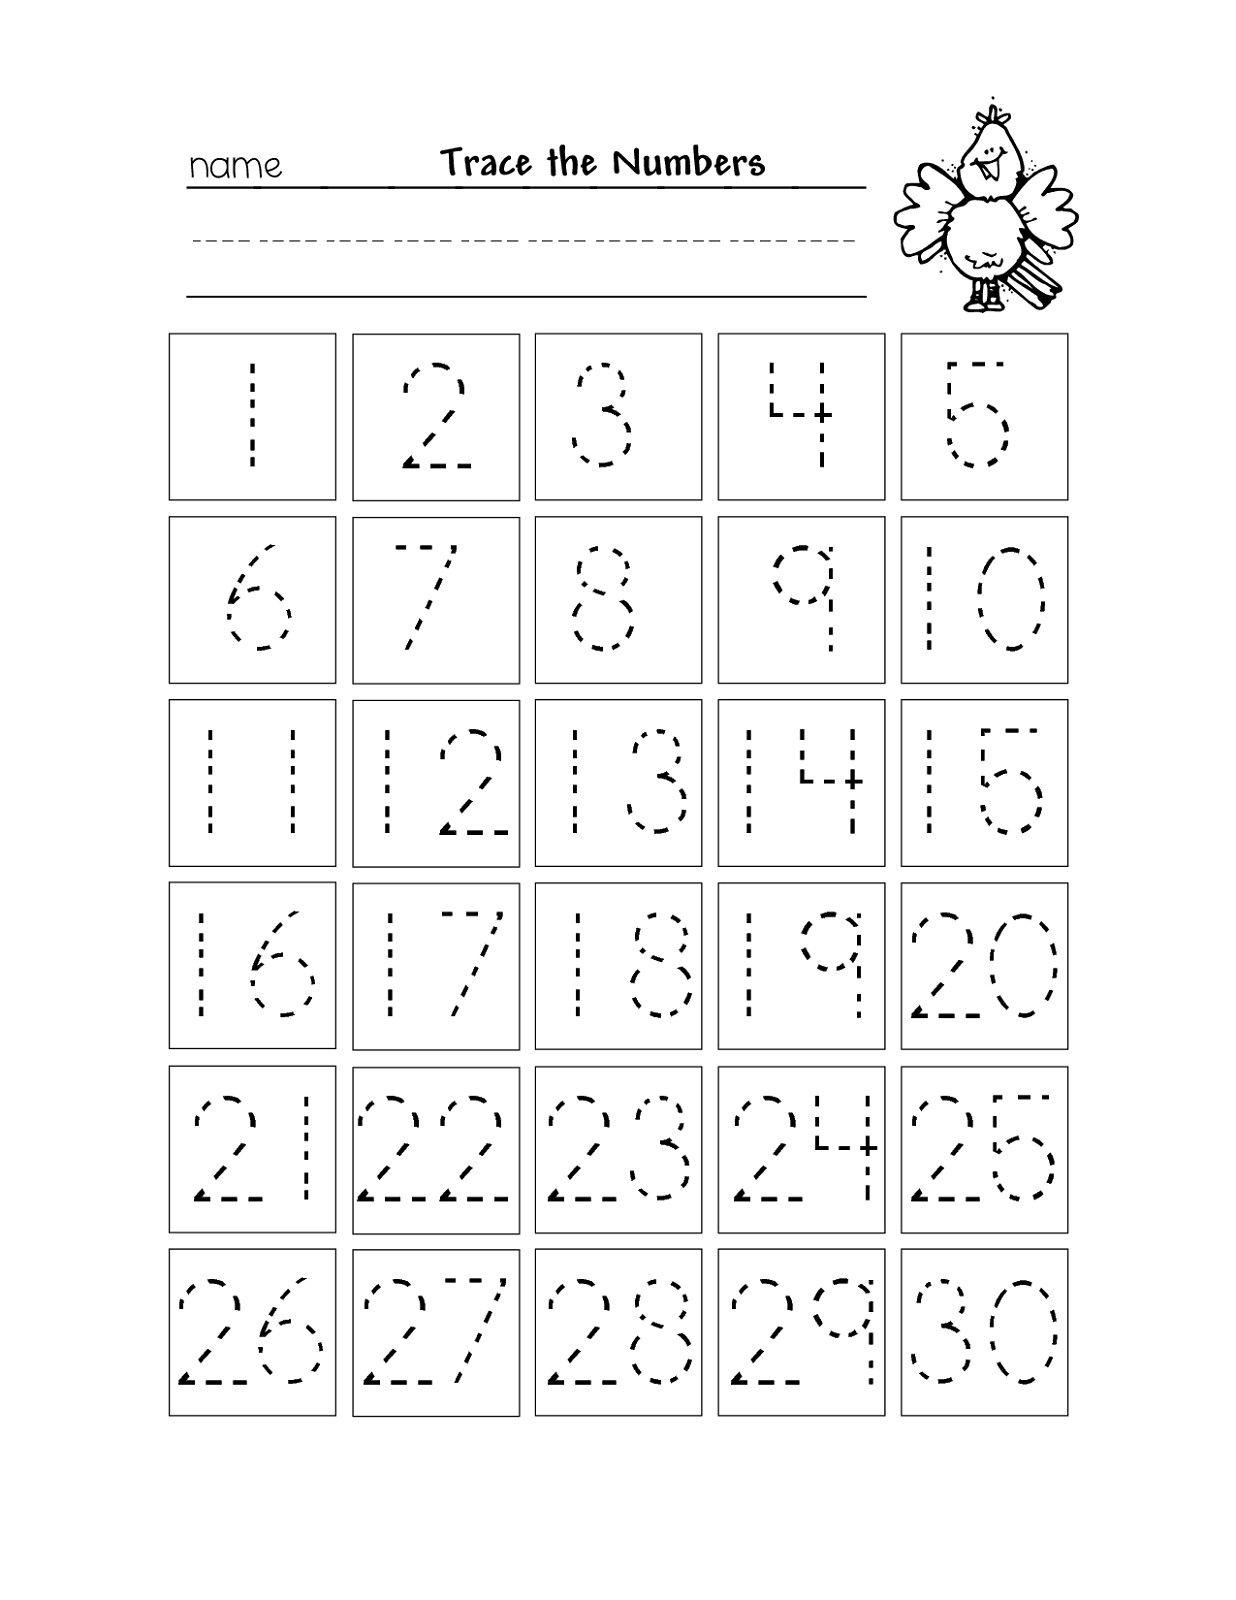 3 Number Tracing Worksheet 3 Kids Worksheets Free